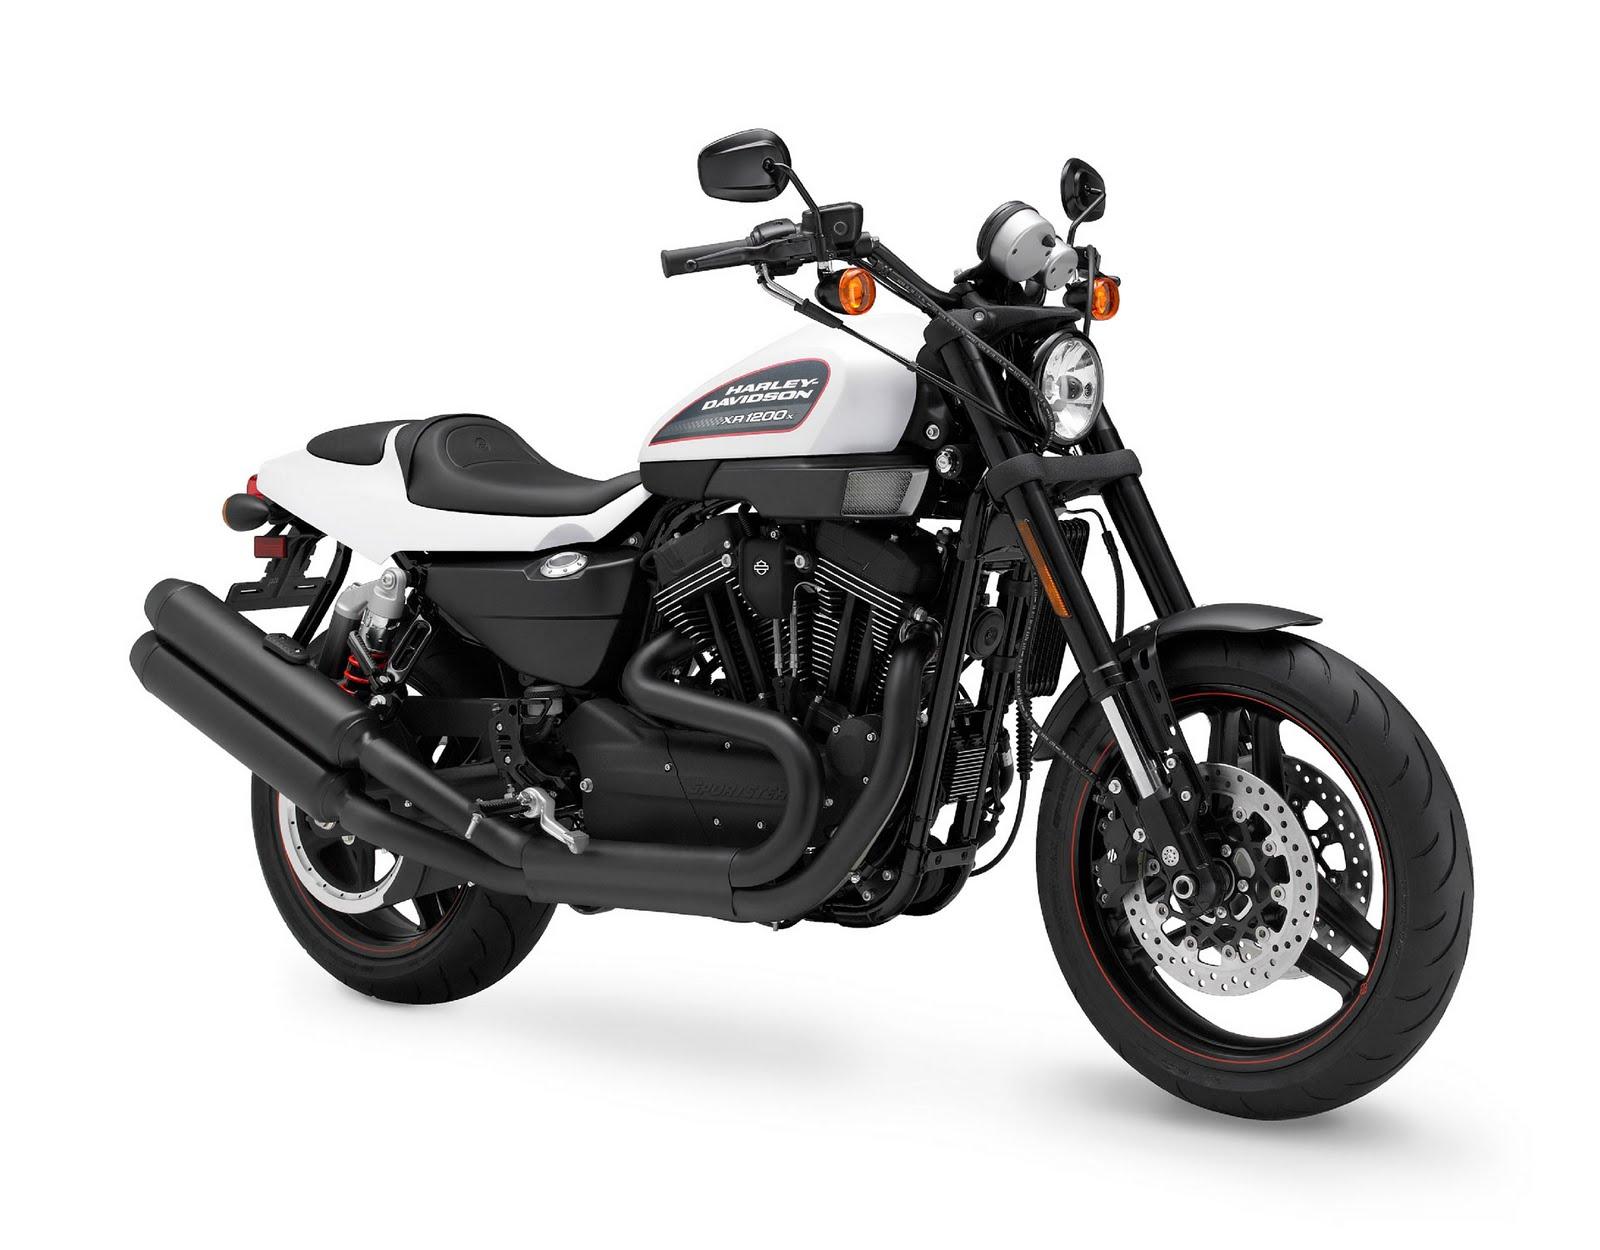 http://2.bp.blogspot.com/_J3_liDBfbvs/TBWwhK7y4zI/AAAAAAAAteM/wM0a_mixQ1E/s1600/2011-Harley-Davidson-XR1200X-Picture.jpg